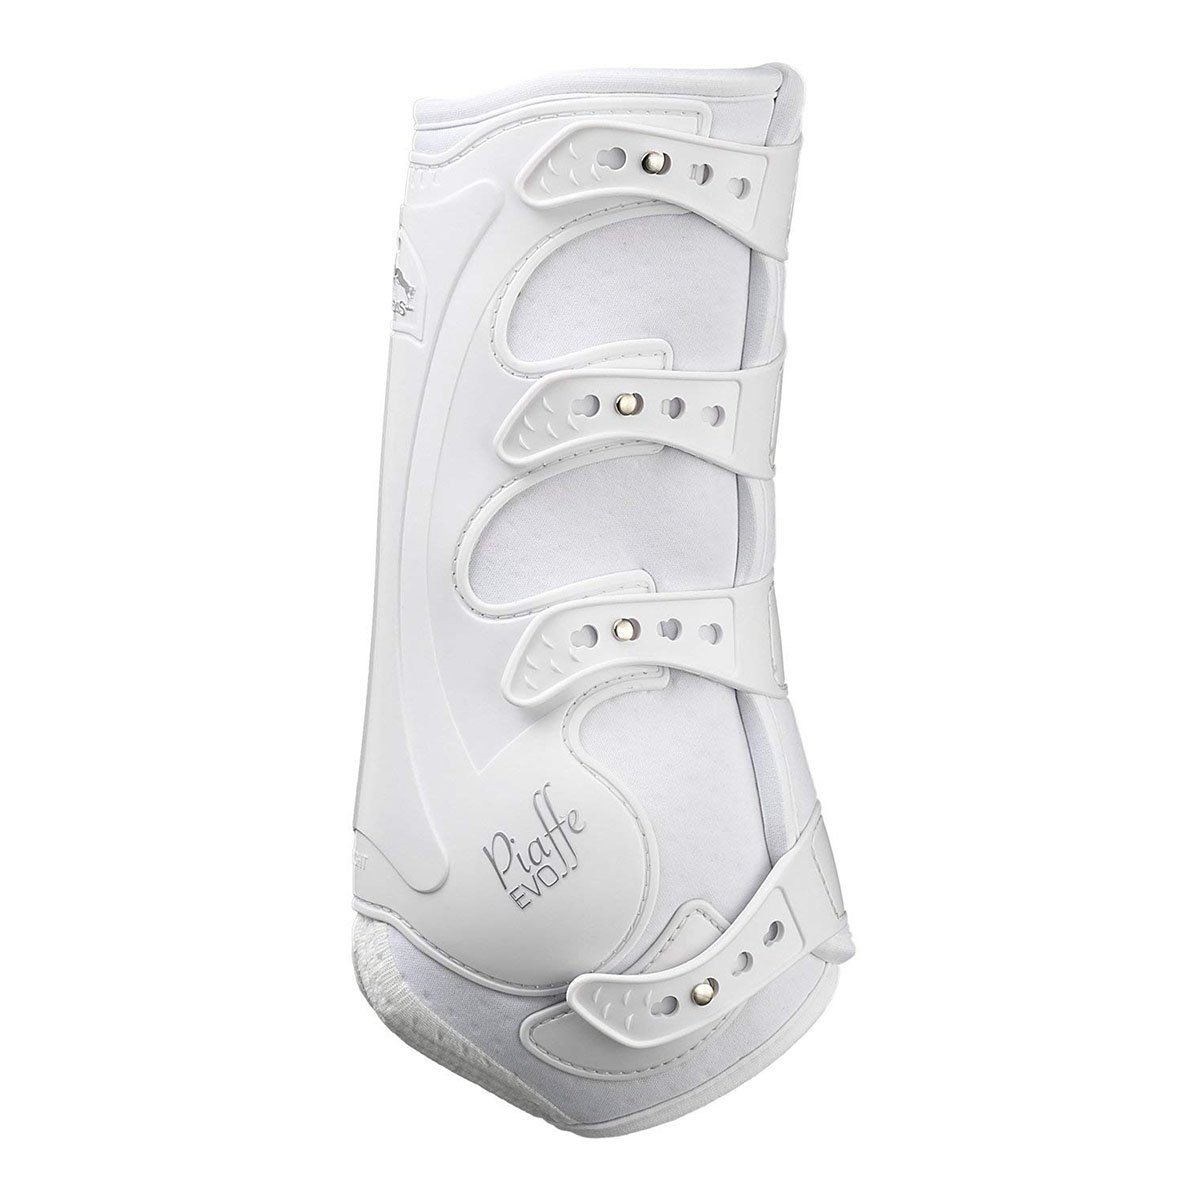 Veredus - Piaffe REVO フロント - ホースブーツ - イタリア製 B07G1HPCDB  ホワイト Large - H 11 1/2\